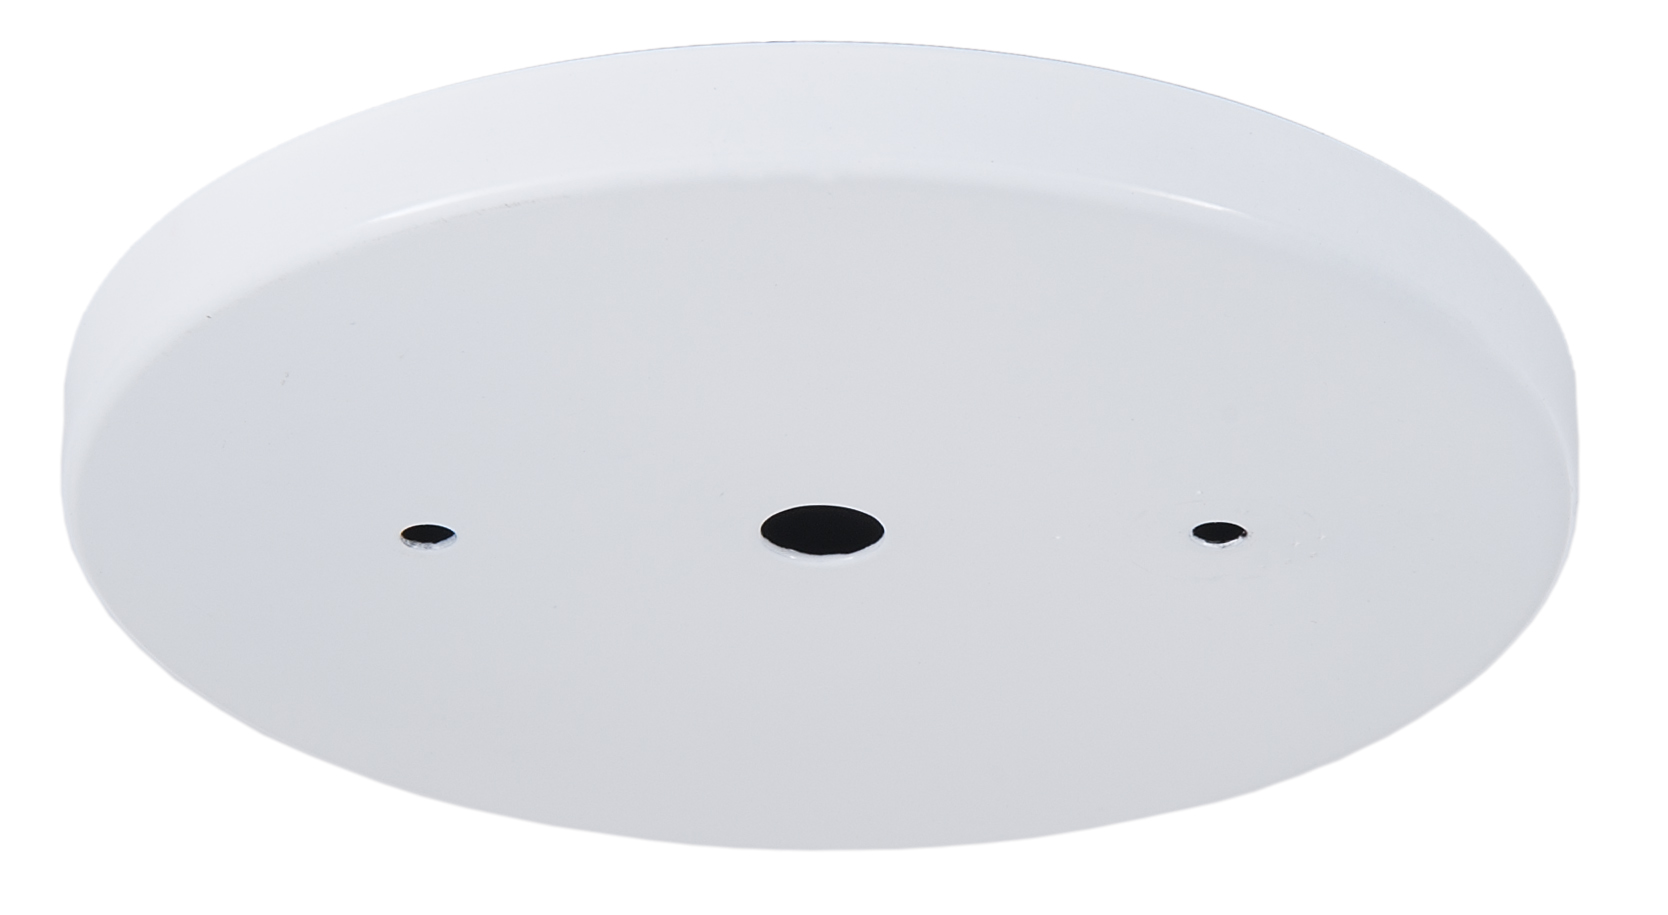 11783W - White Modern Shallow Canopy u0026 Canopy Kits  sc 1 st  Bu0026P L& Supply & White Modern Shallow Canopy u0026 Canopy Kits 11783W   Bu0026P Lamp Supply